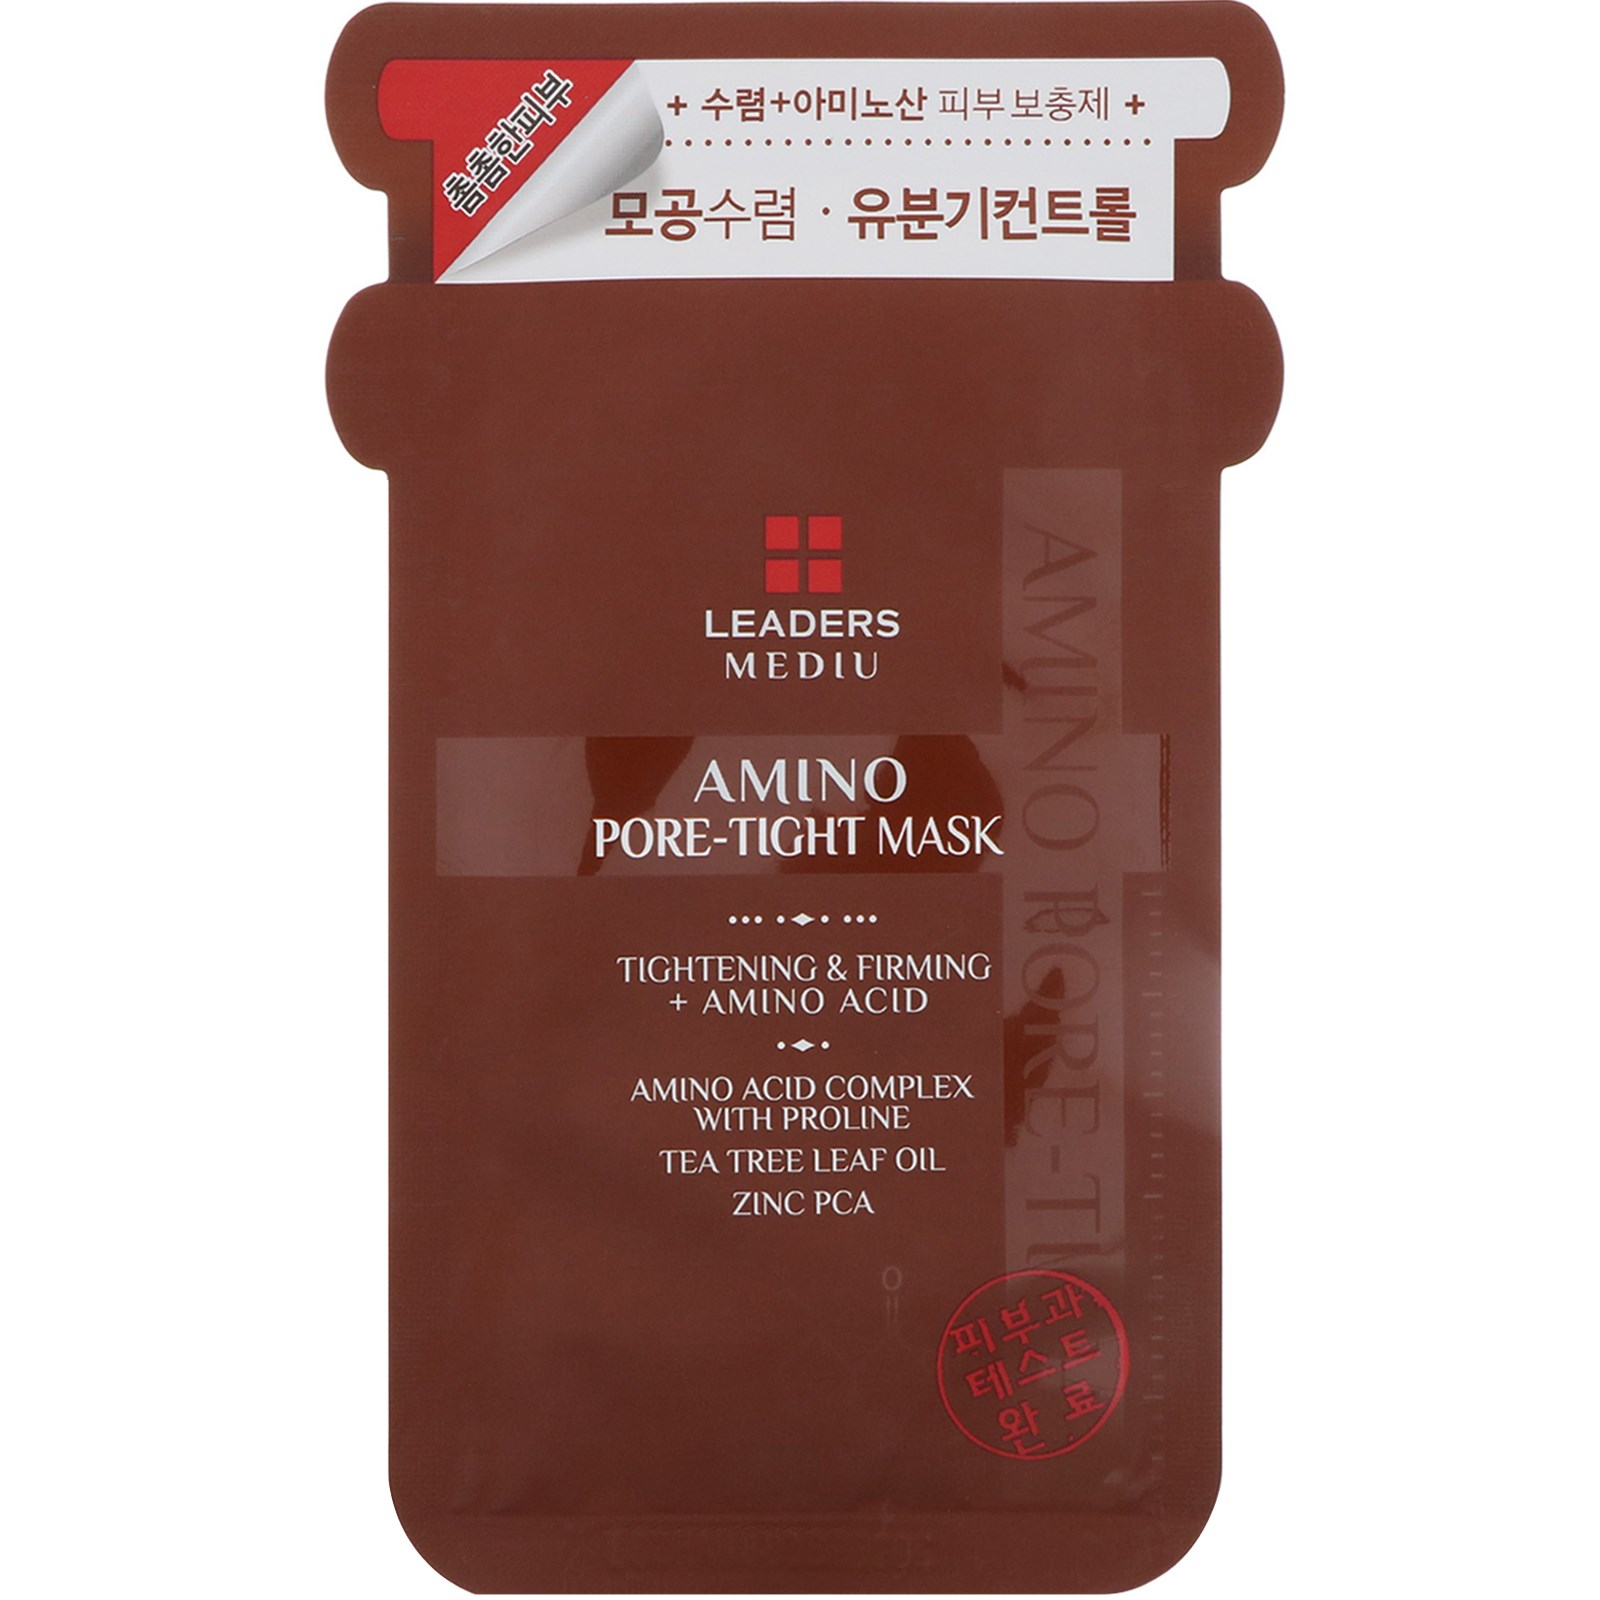 Leaders, Mediu, Amino Pore-Tight Mask, 1 Mask, 25 ml